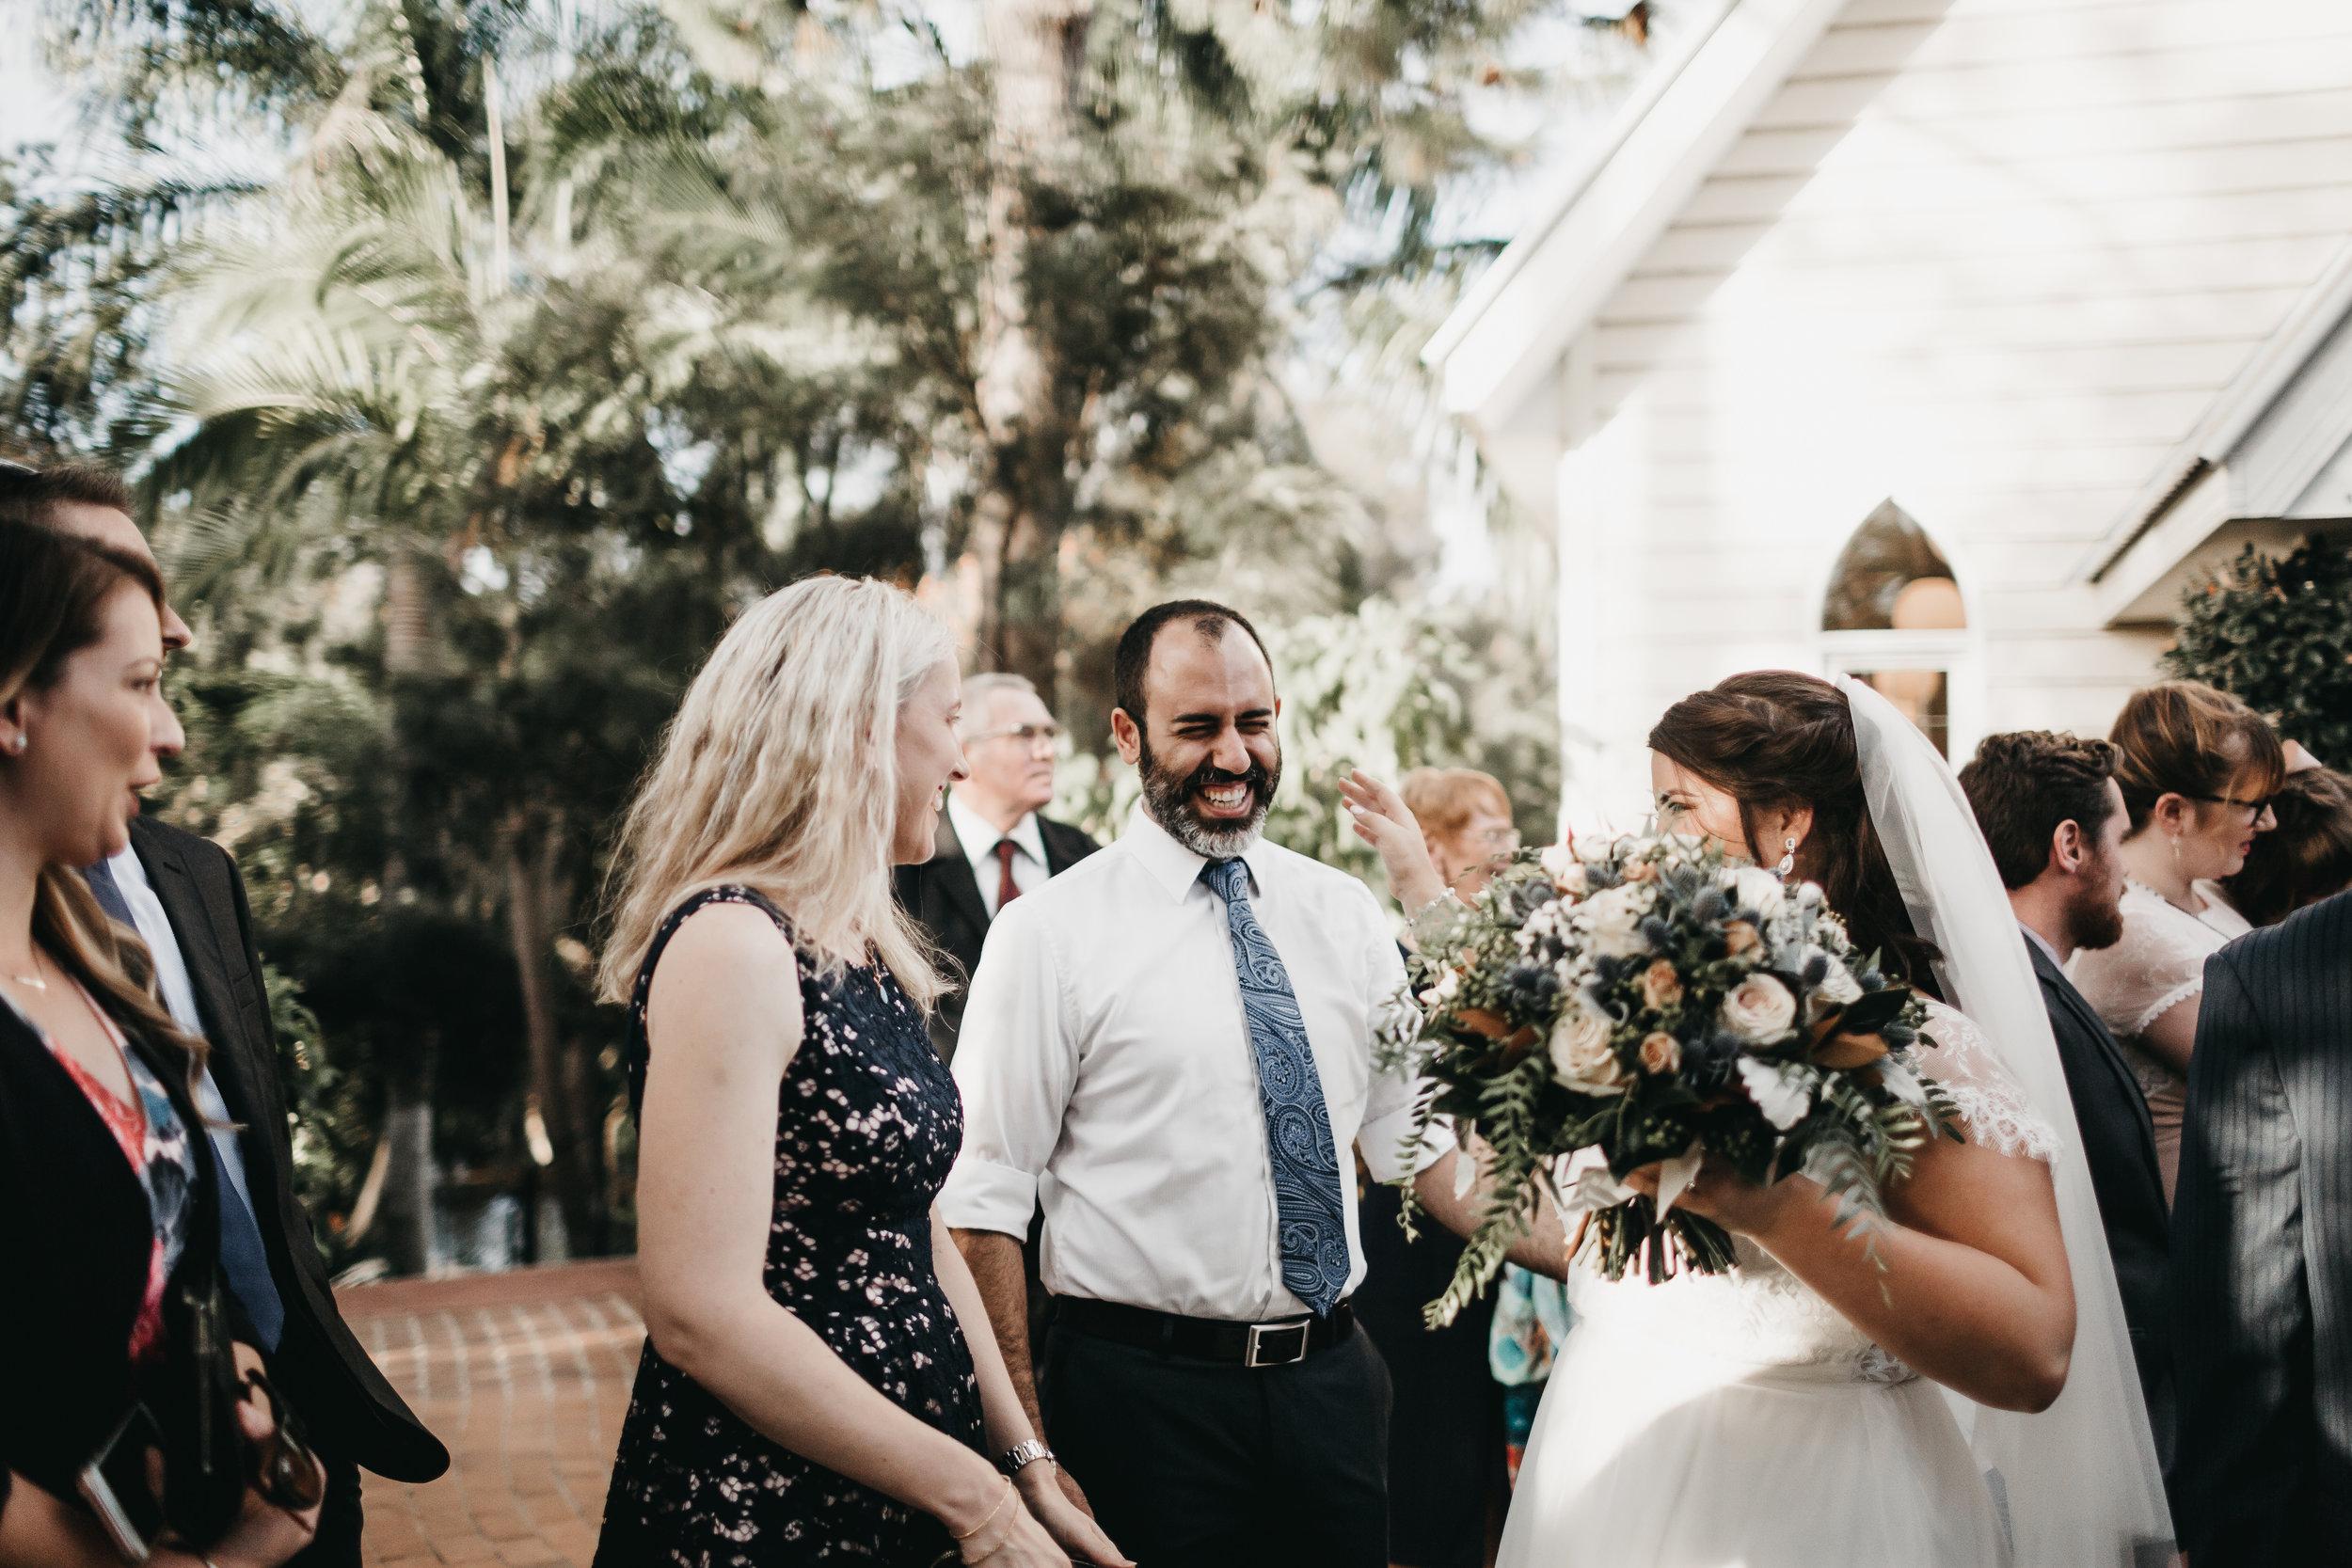 bondwedding-435.jpg